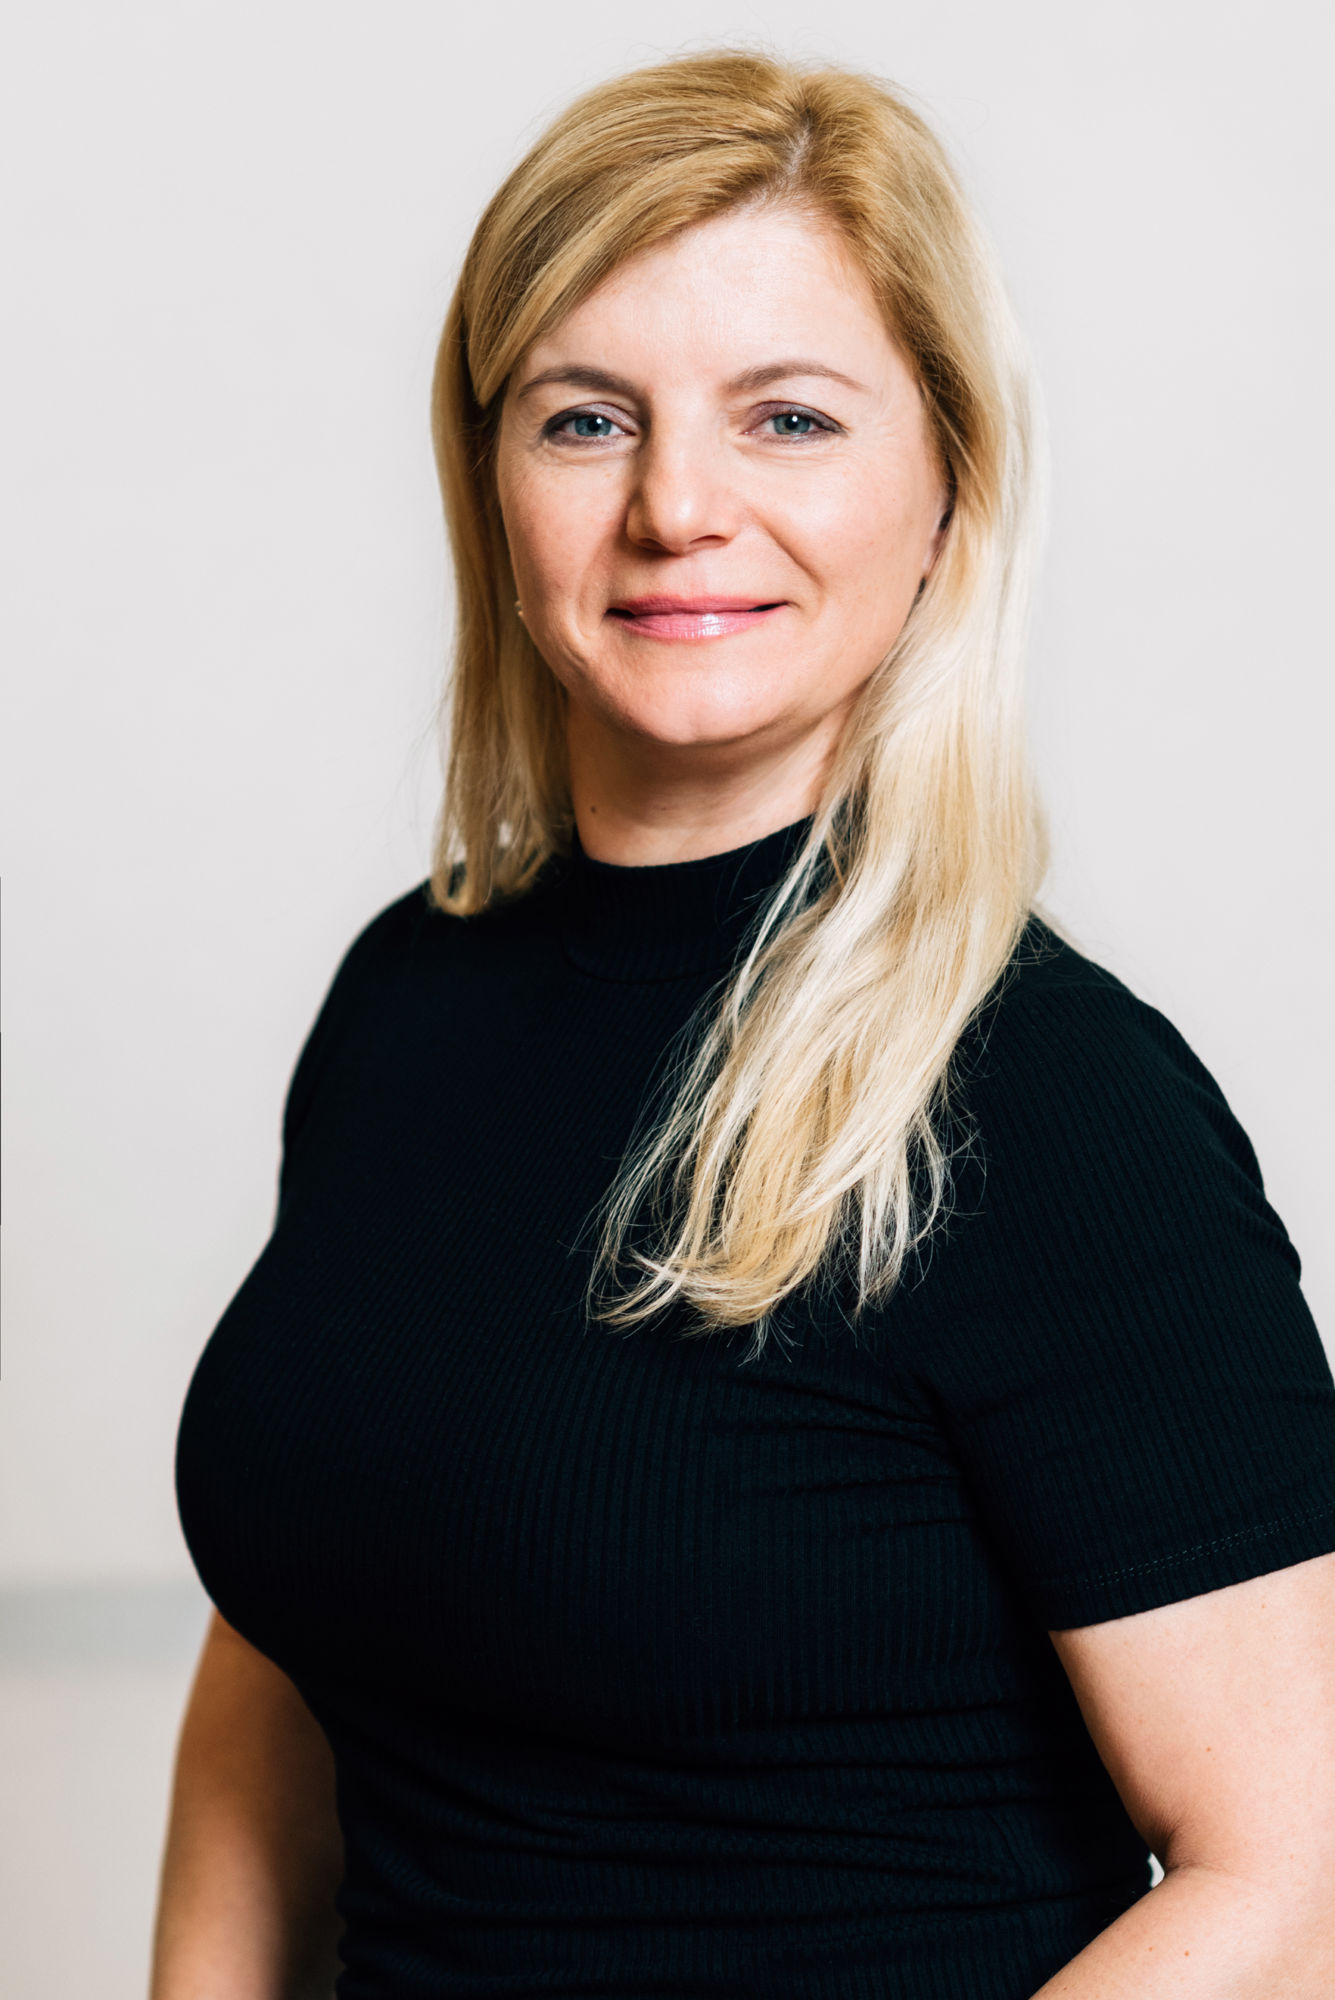 evatrhonova-mladaboleslav-instruktor-fitpainfree-hanatoufarova-czech-terapeut-posturalni-cviceni-bezbolesti-cviky-fpf-academy-lektor-painfree